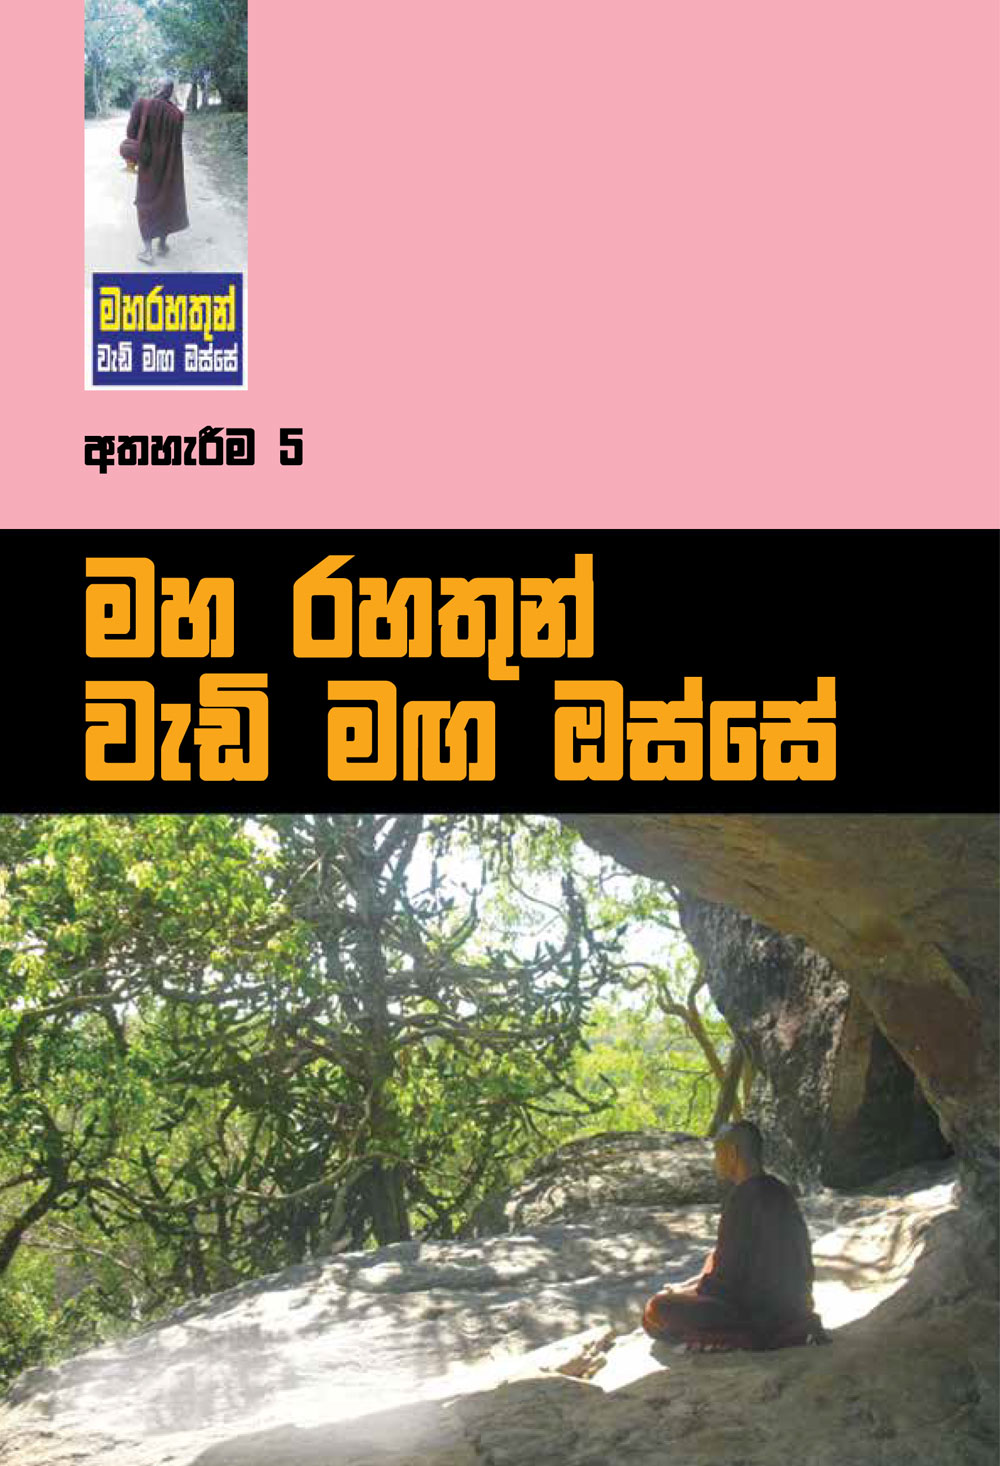 Maha Rahathun Wadi Maga Osse Book 5